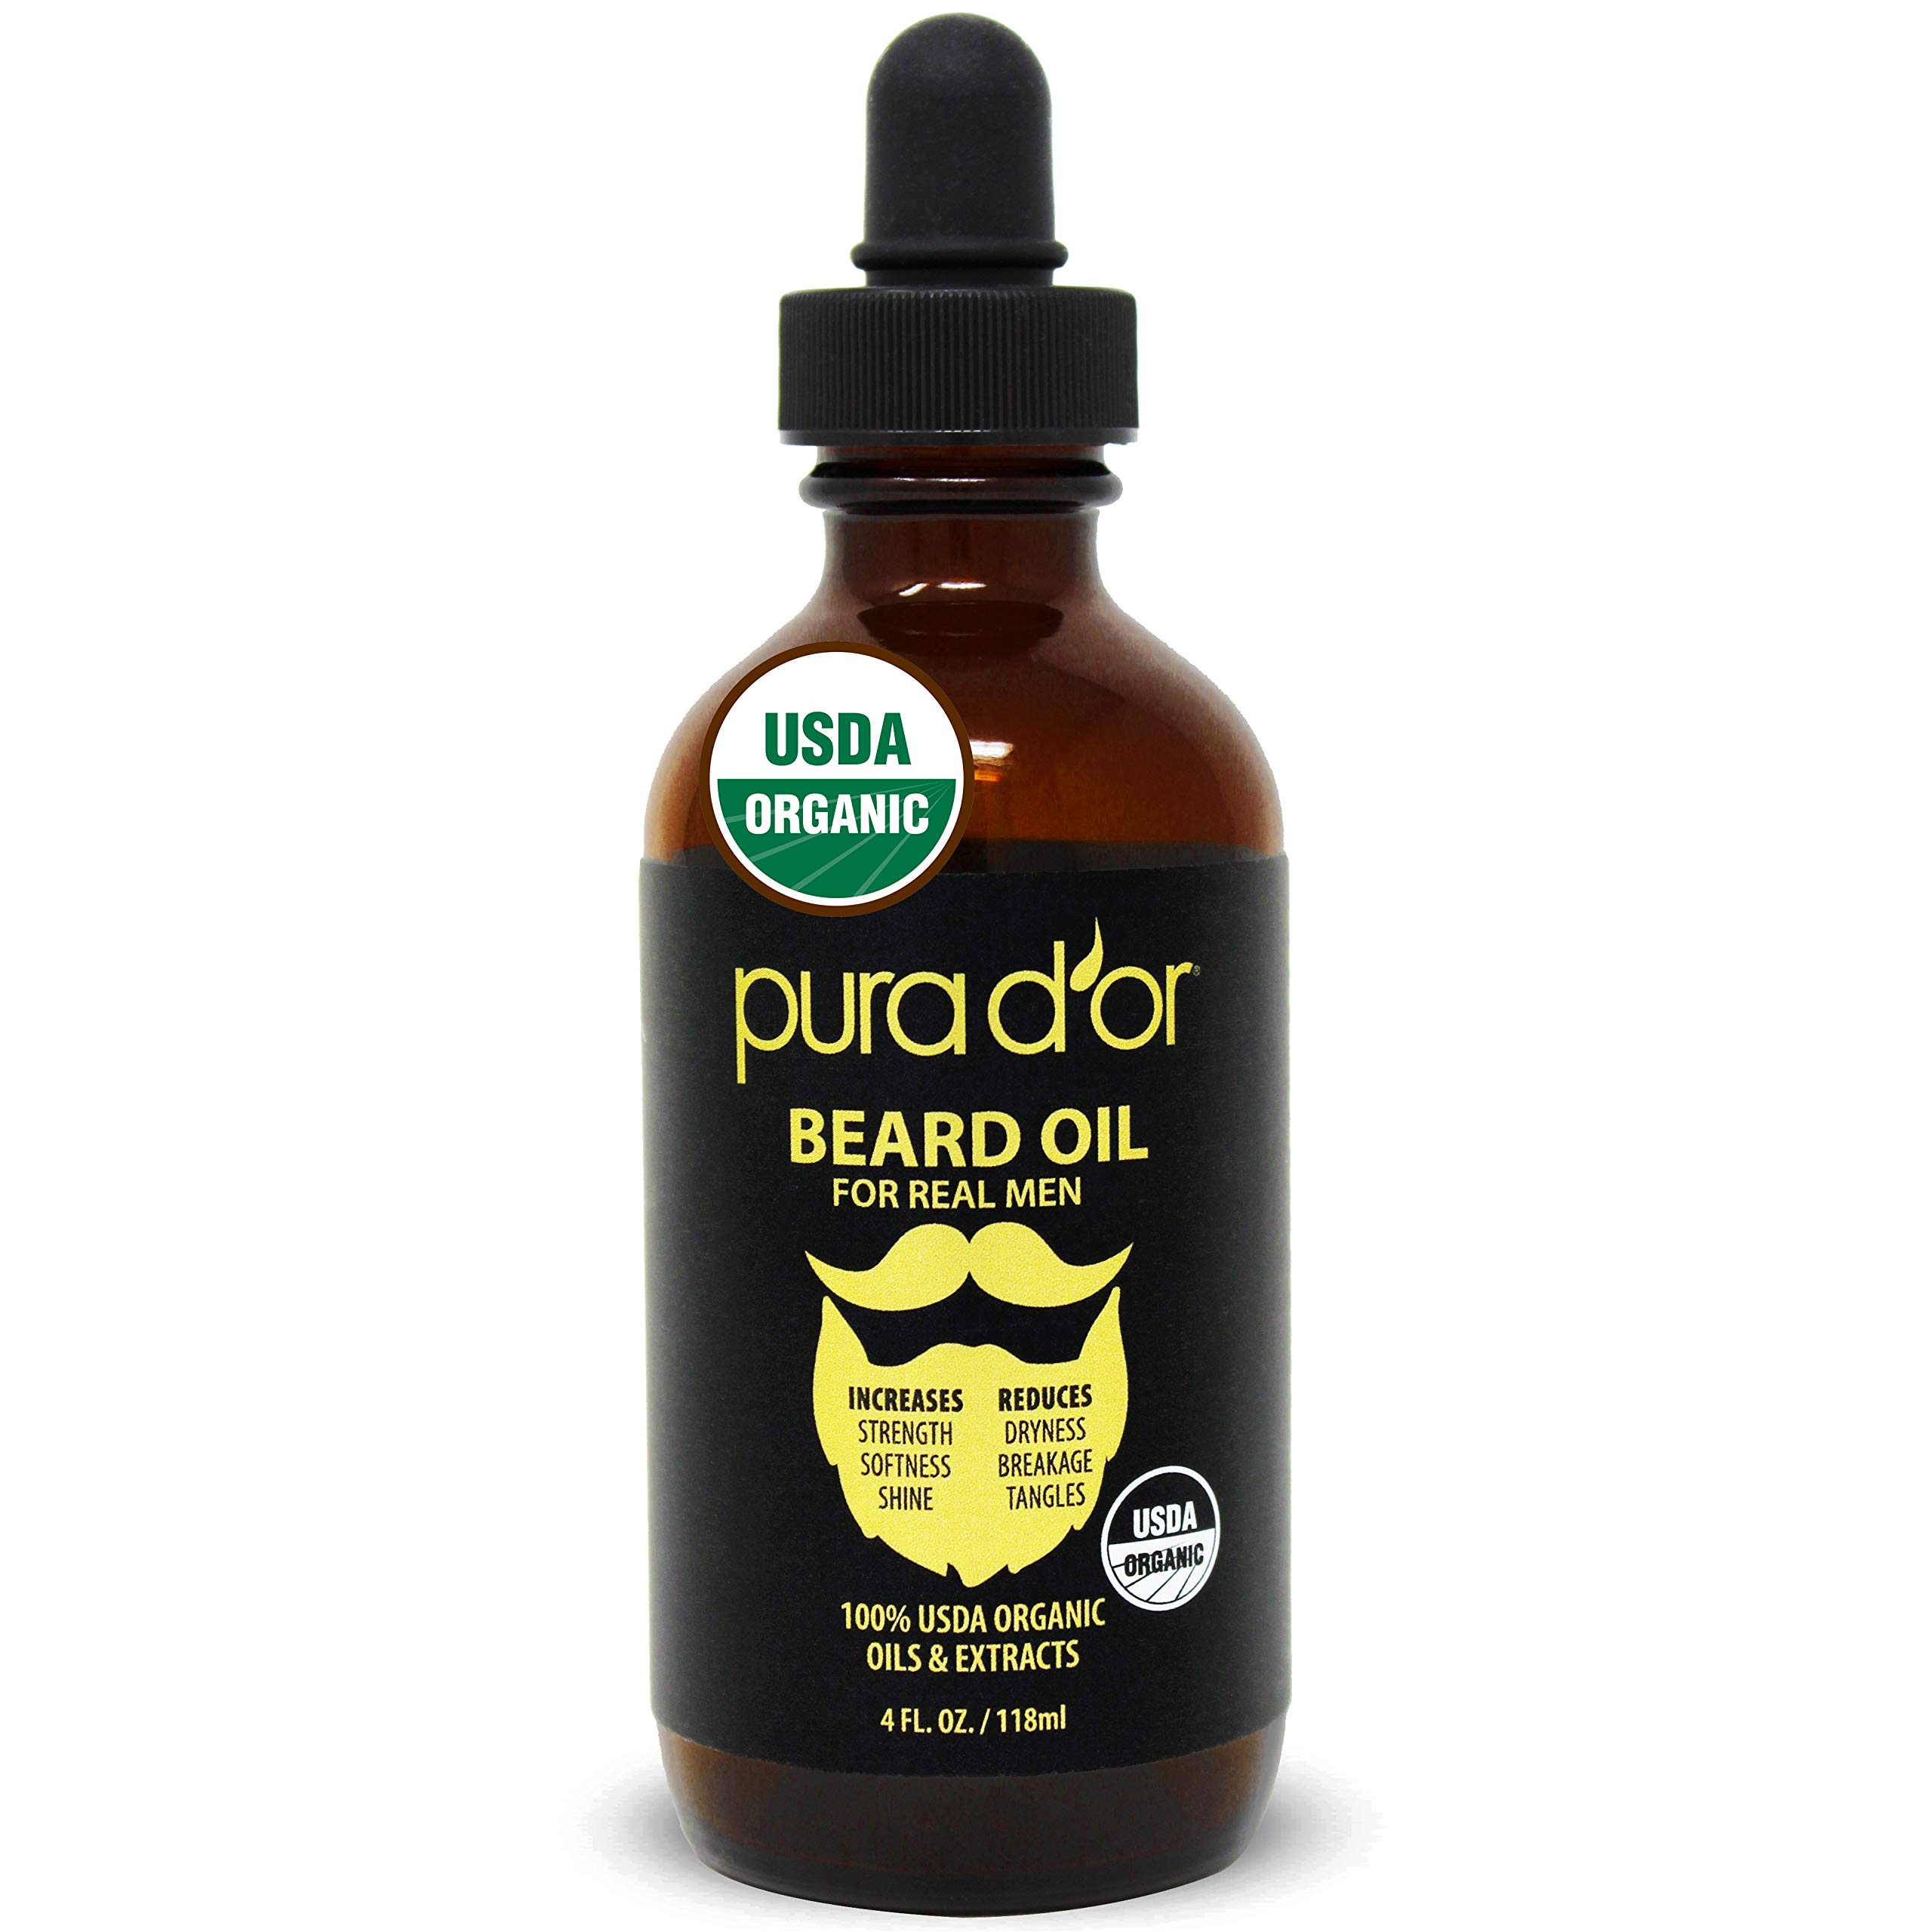 PURA D'OR Beard Oil (4oz / 118mL) USDA Organic 100% Pure Natural Leave-In Conditioner w/Argan & Jojoba Oil - Mustache Care & Maintenance. Helps Increase Softness & Strength FOR MEN (Packaging Varies)